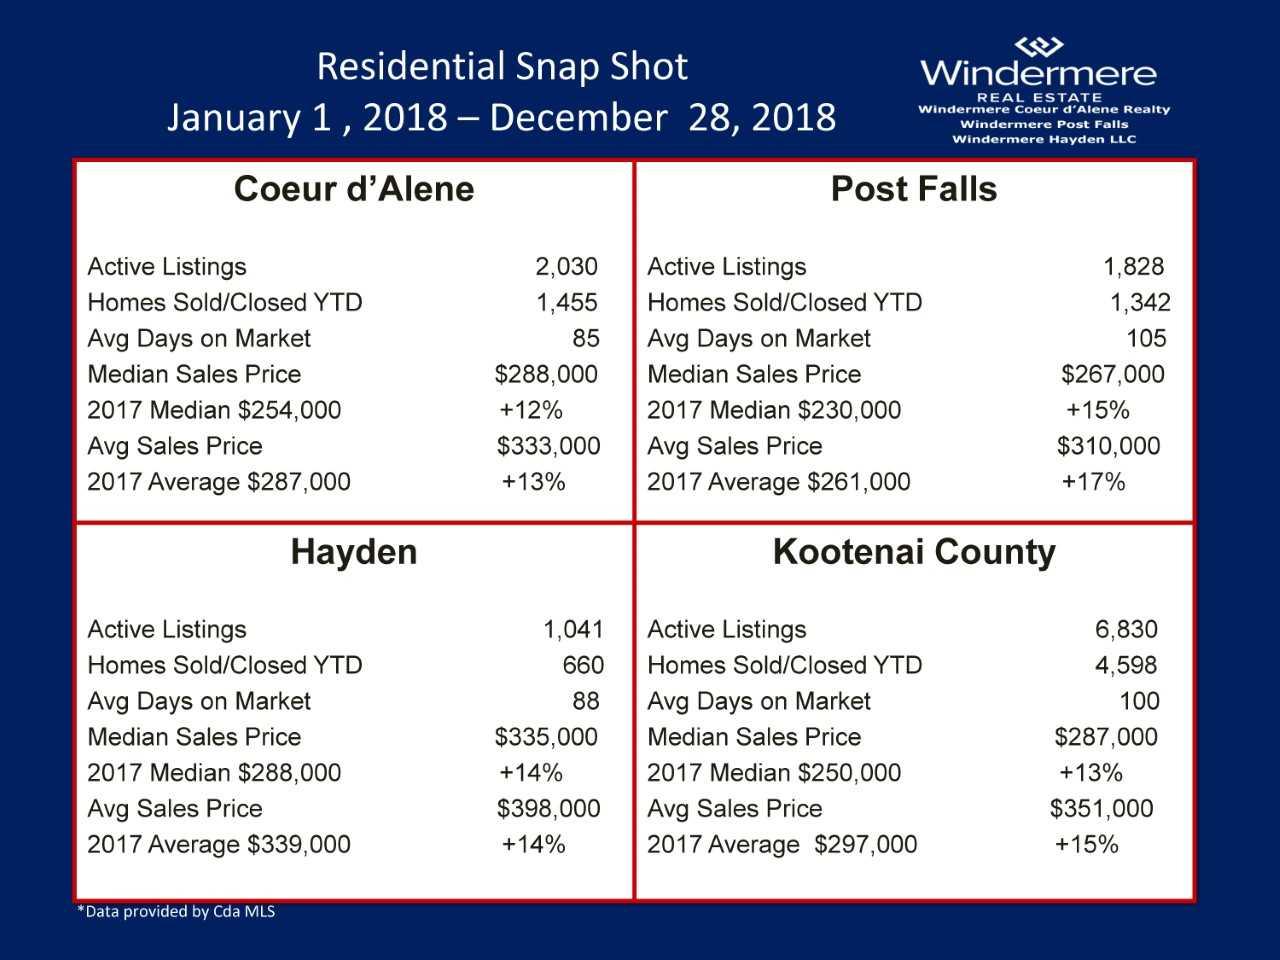 Coeur d'Alene Real Estate 2018 Market Statistics lakecdarealestate.com Michelle Garcia REALTOR